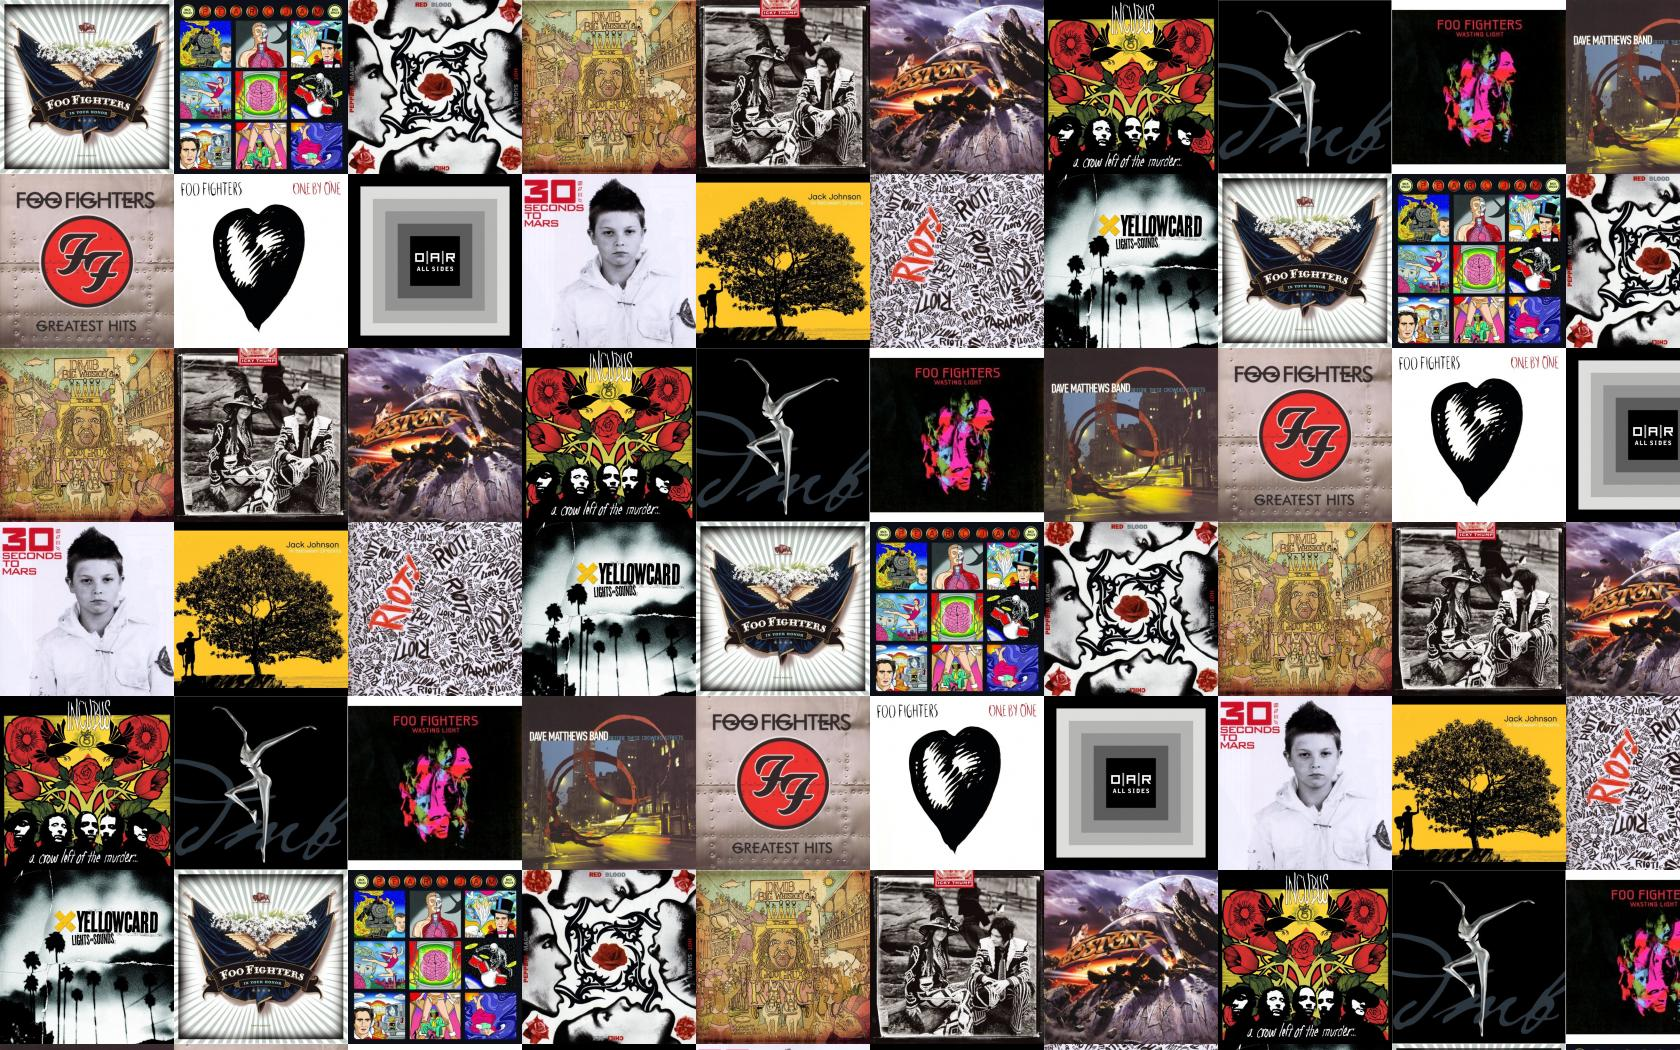 Foo Fighters In Your Honor Pearl Jam Backspacer Wallpaper Tiled Desktop